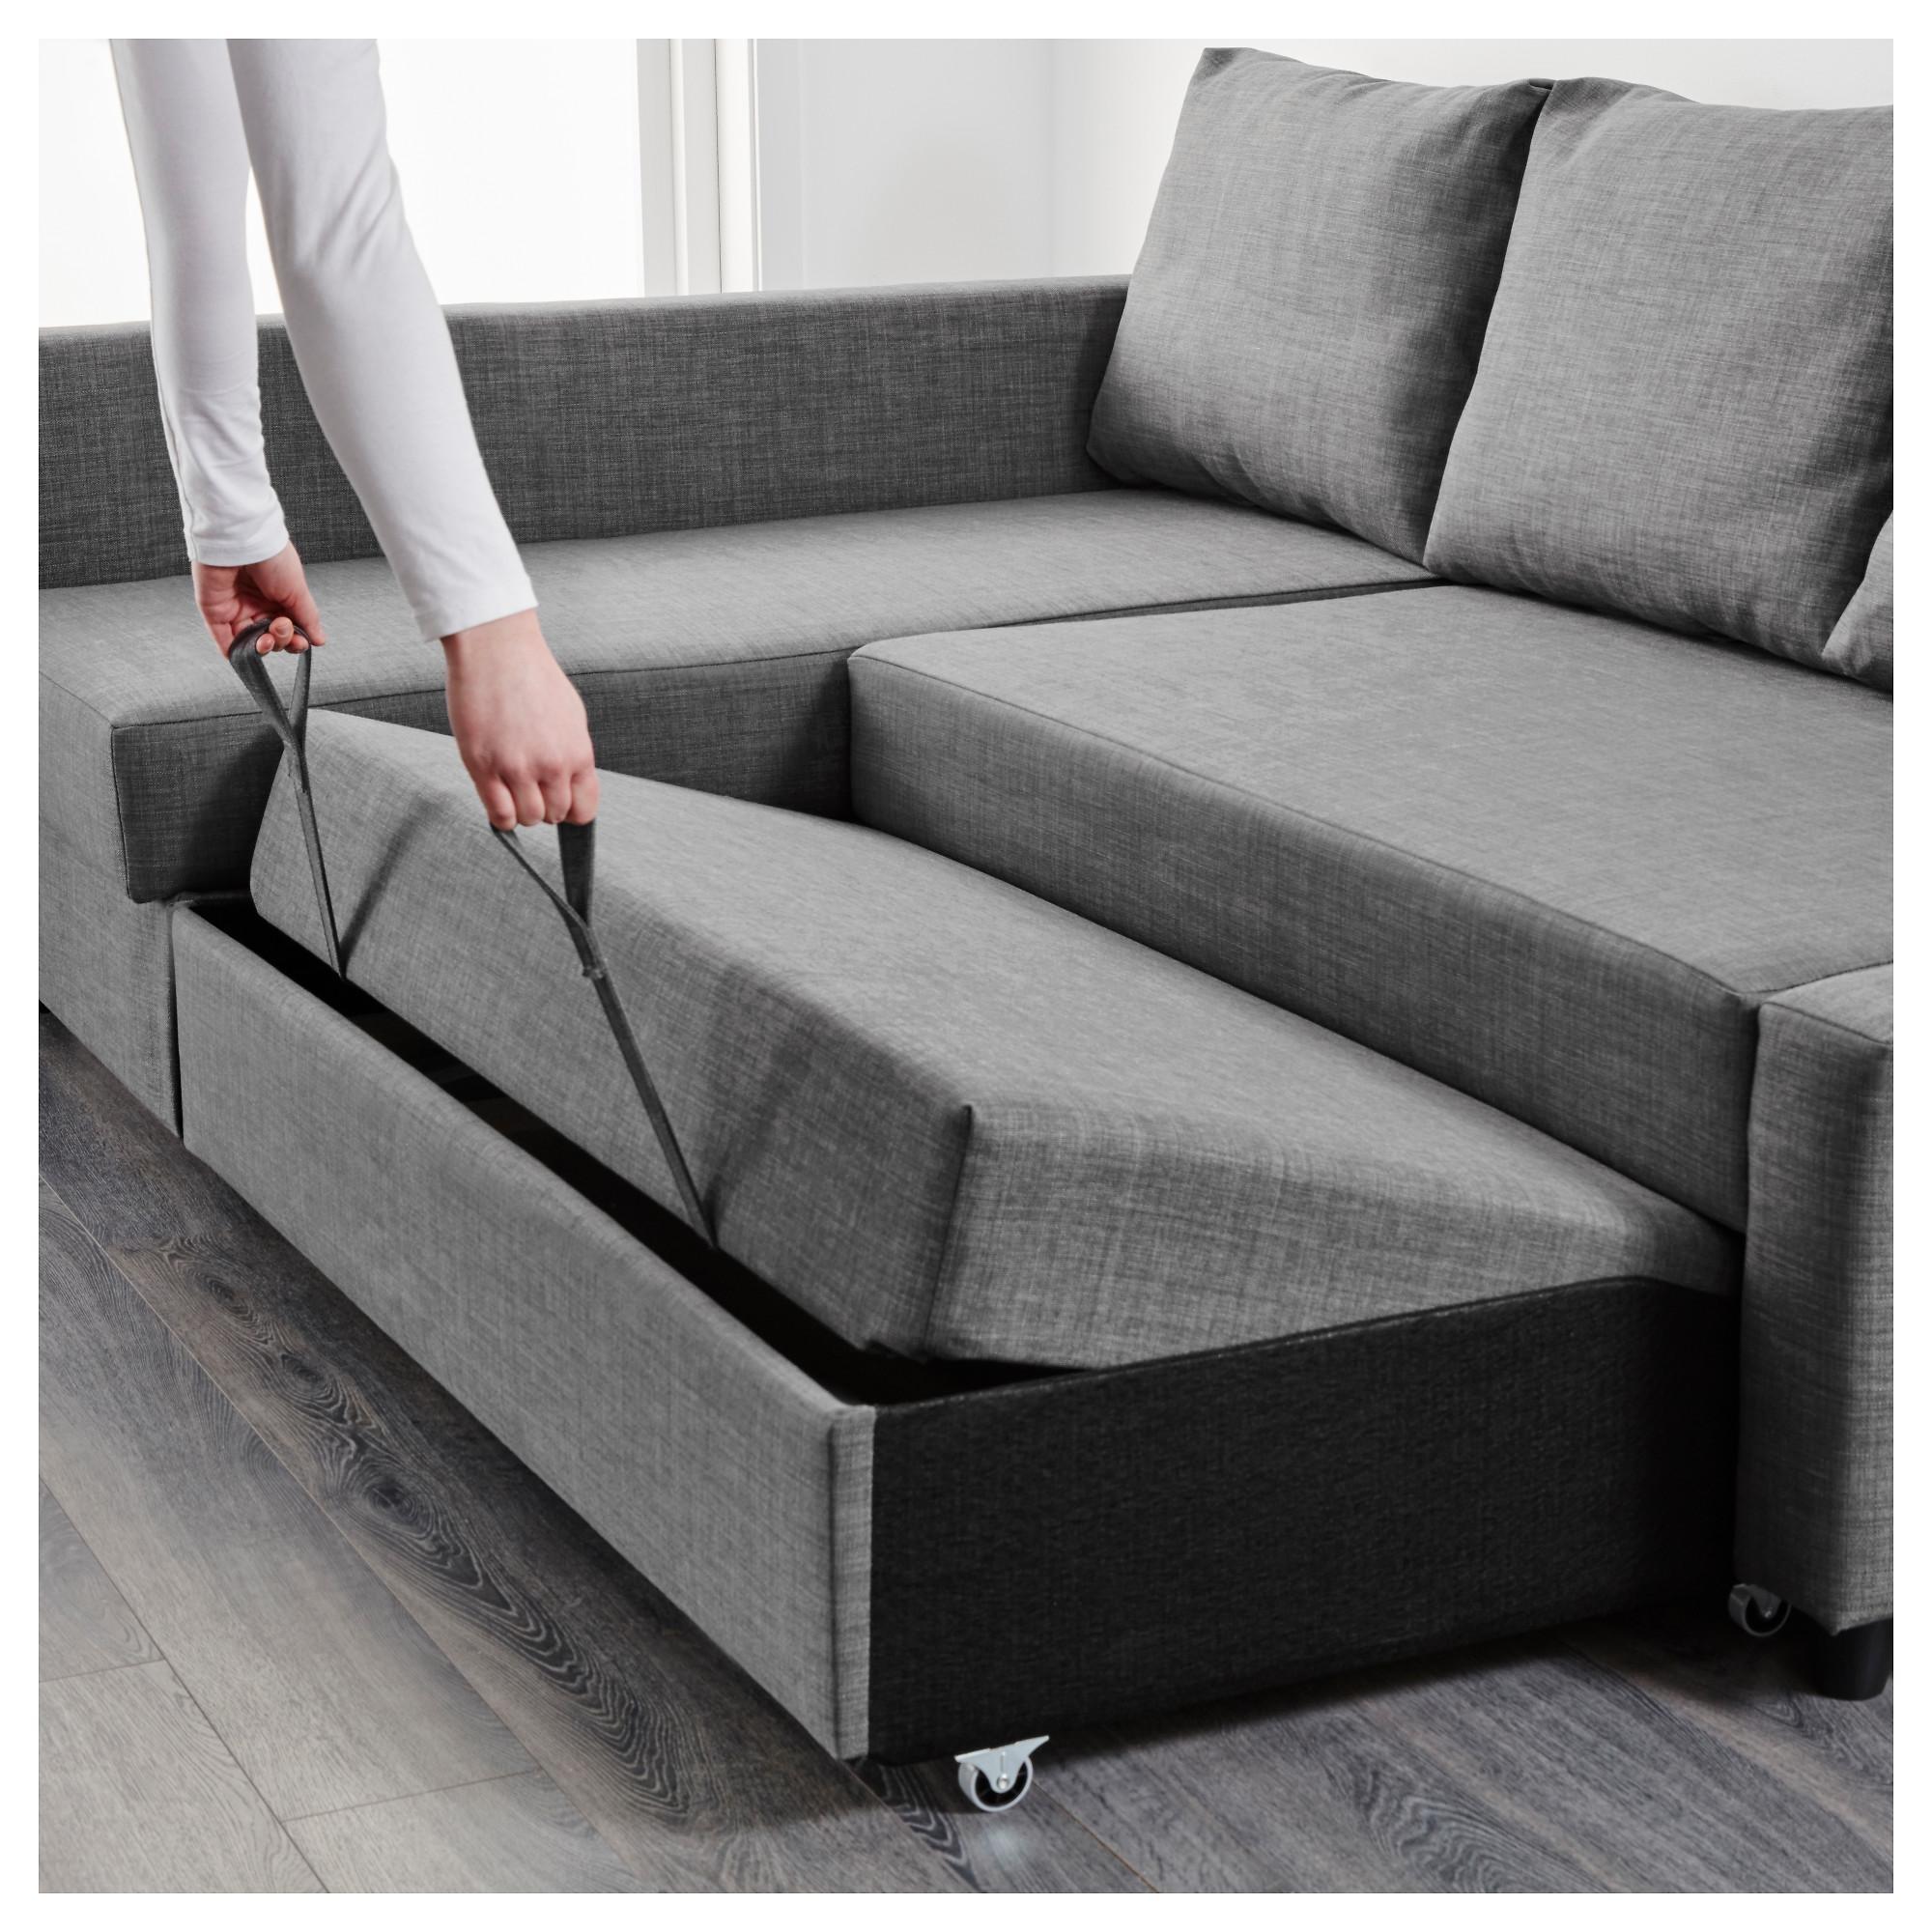 Friheten Corner Sofa Bed With Storage Skiftebo Dark Grey – Ikea With Storage Sofa Ikea (Image 8 of 20)